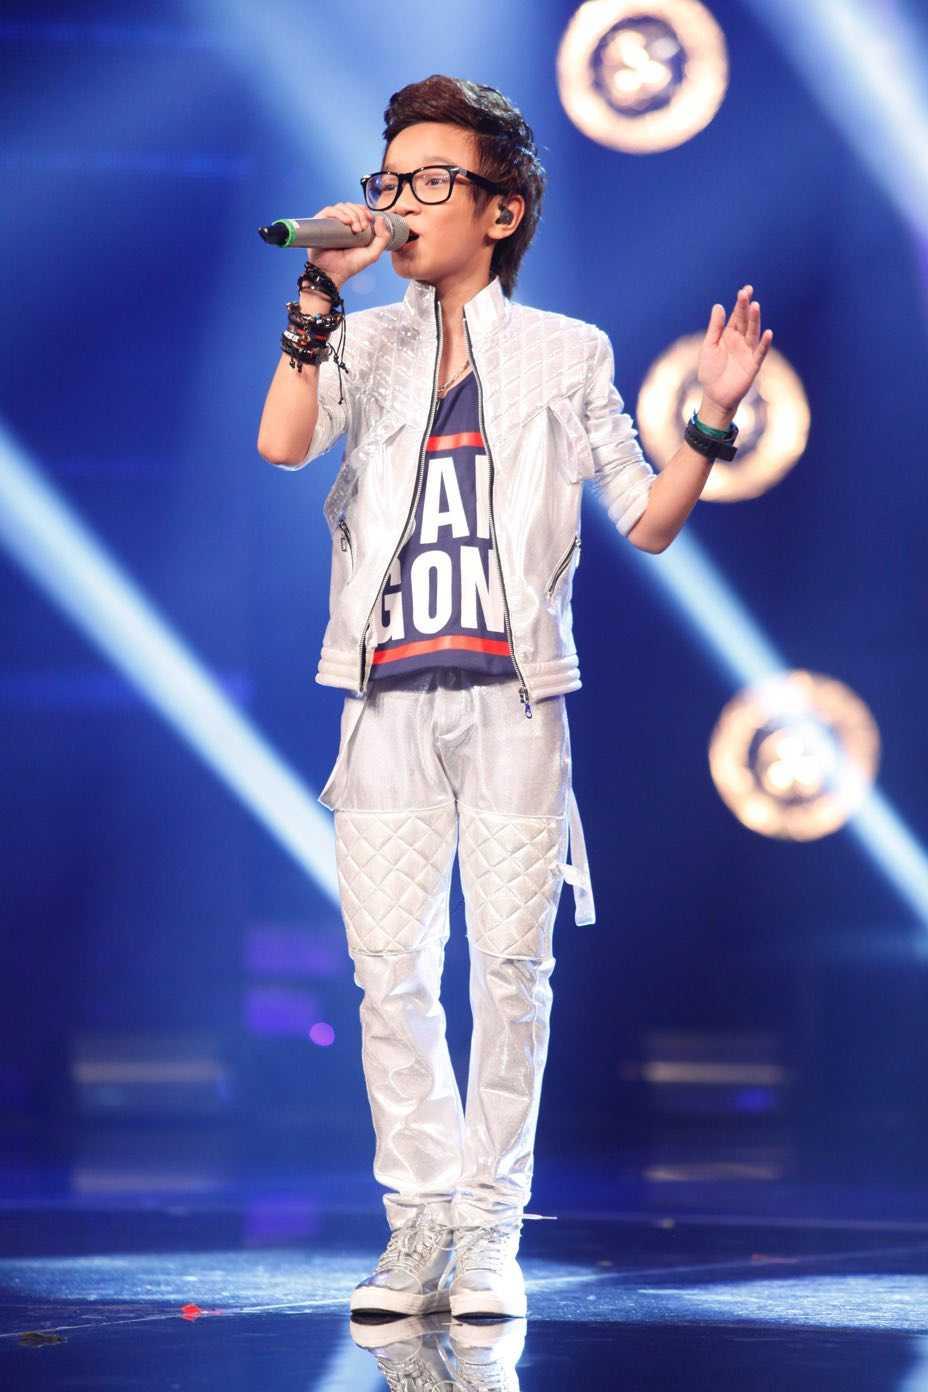 Truc tiep liveshow top 10 Vietnam Idol Kids: 10 'thien than nho' da san sang hinh anh 14